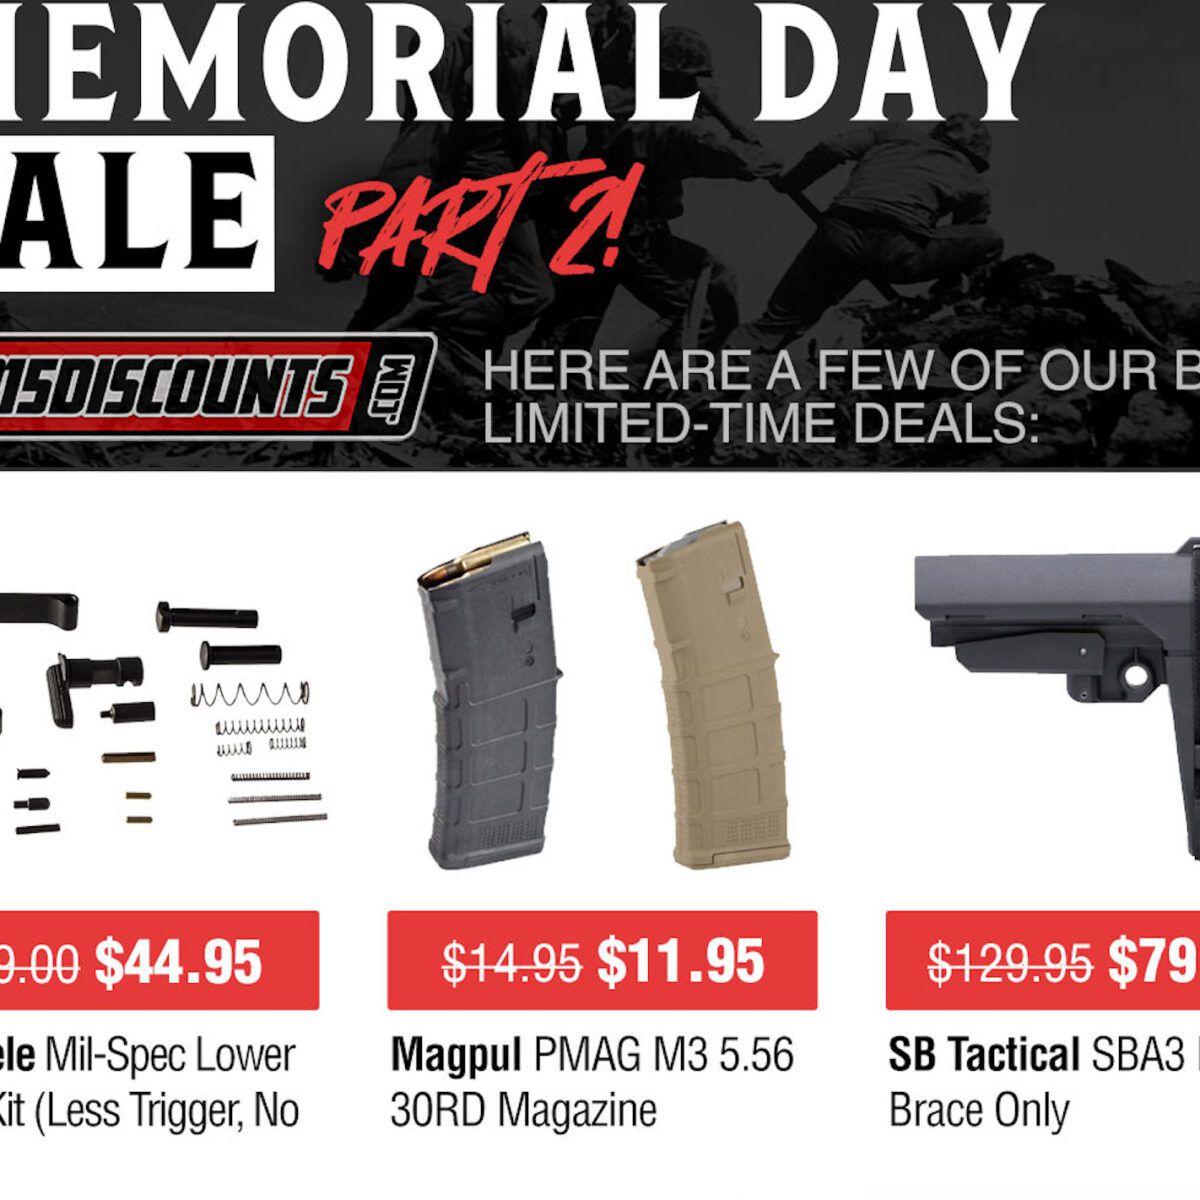 Memorial Day Deals are Live at AR15Discounts.com